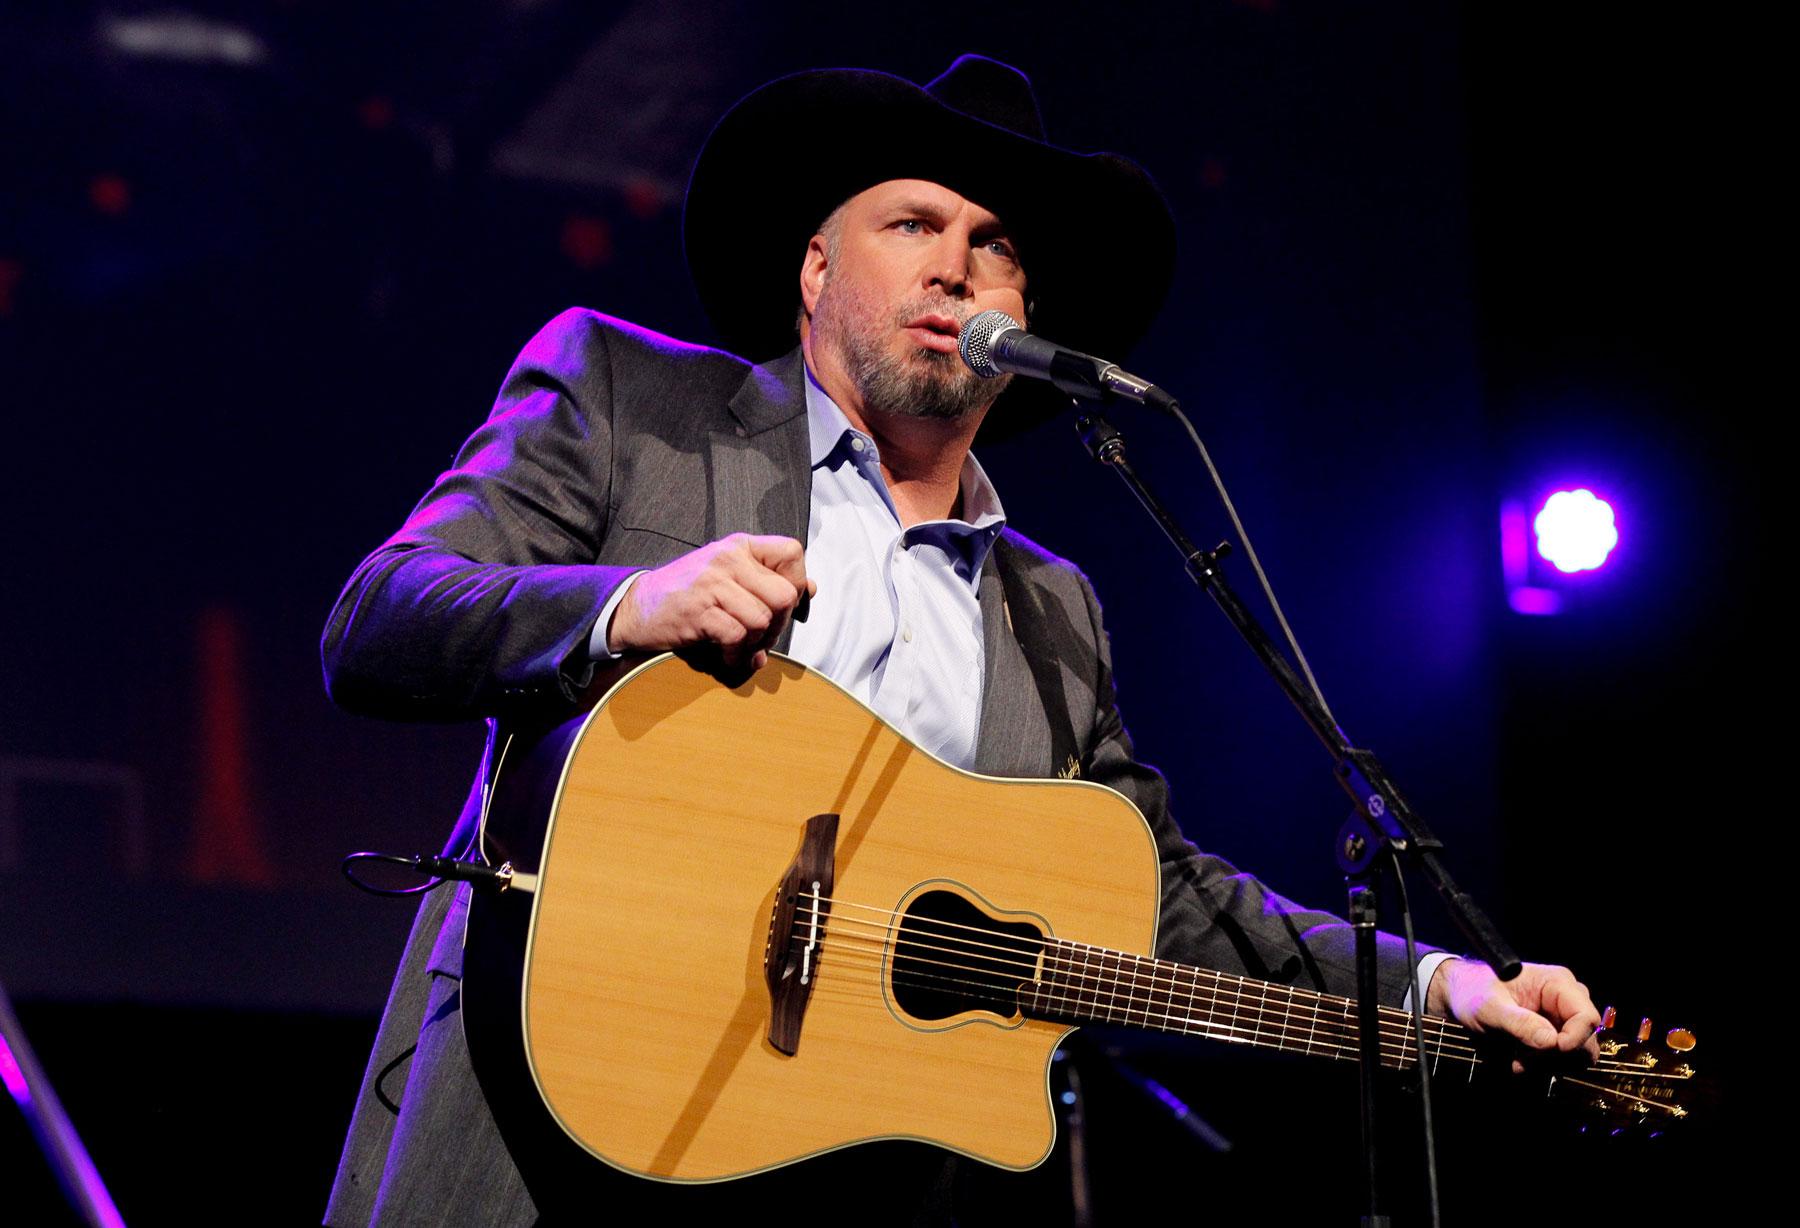 Garth Brooks' Big Comeback Tour Still Keeping Us Guessing